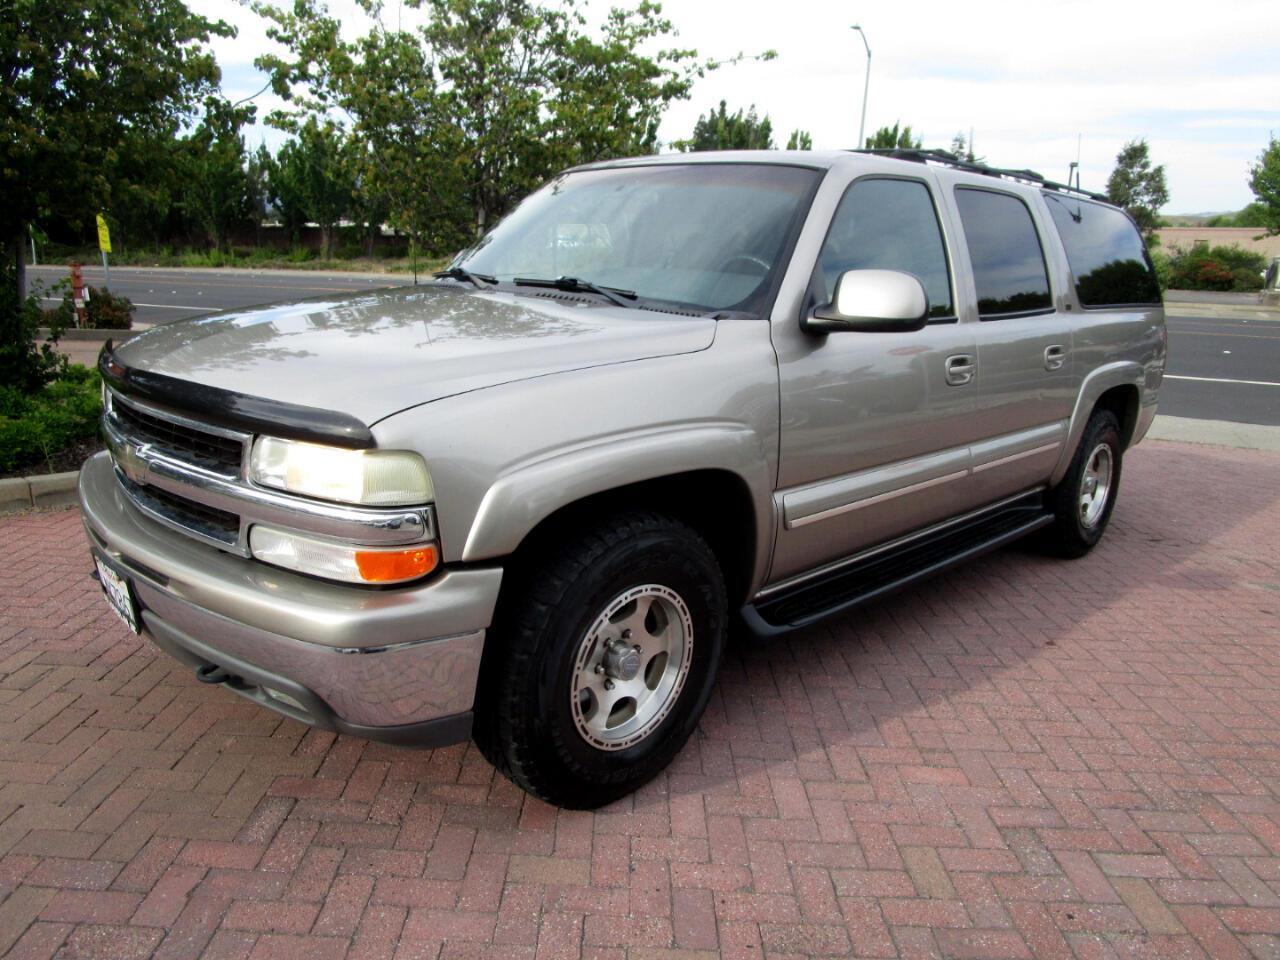 2001 Chevrolet Suburban LT1500 PKG**** 4WD**TOW PKG**3RD ROW**